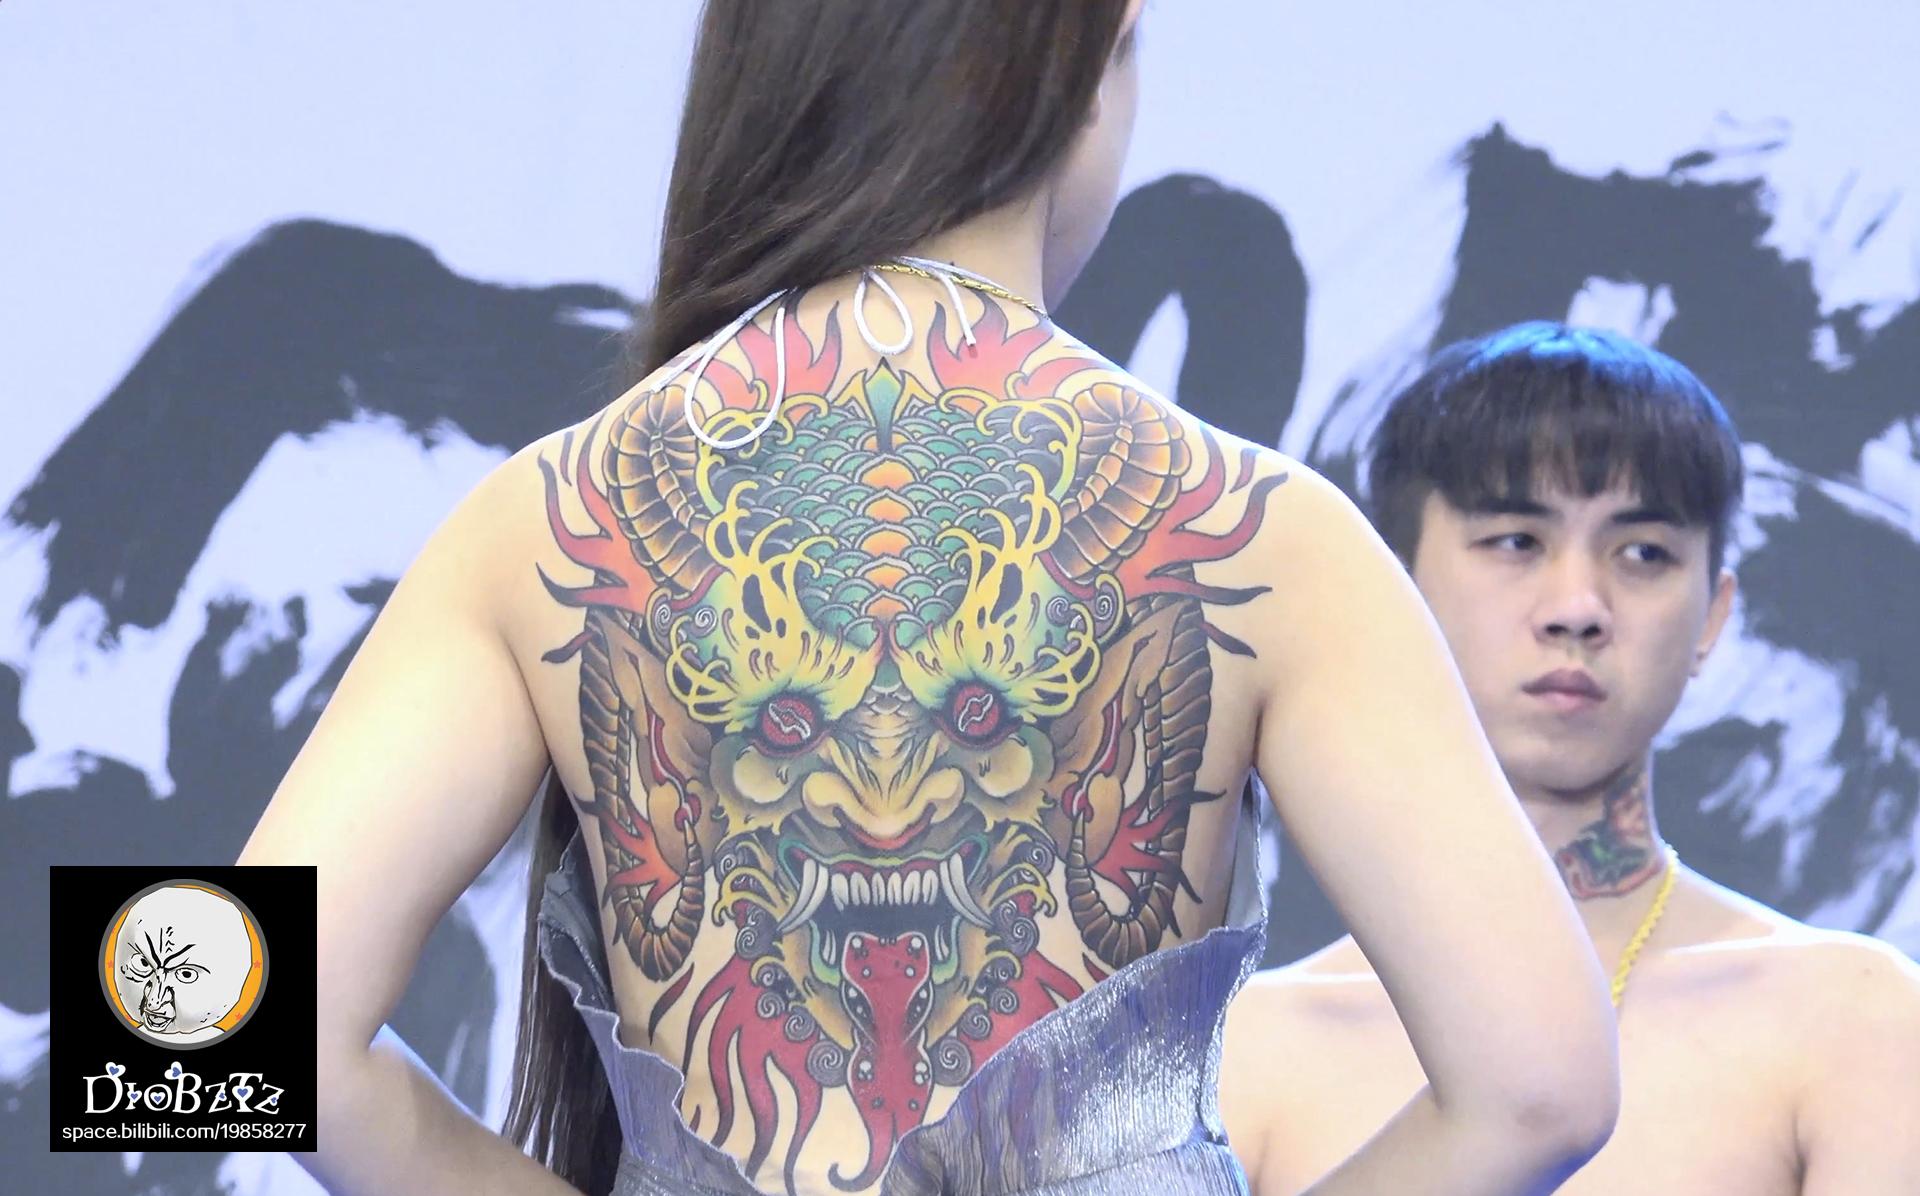 up变身纹身师带你去看纹身展(欧美背部彩色大图)